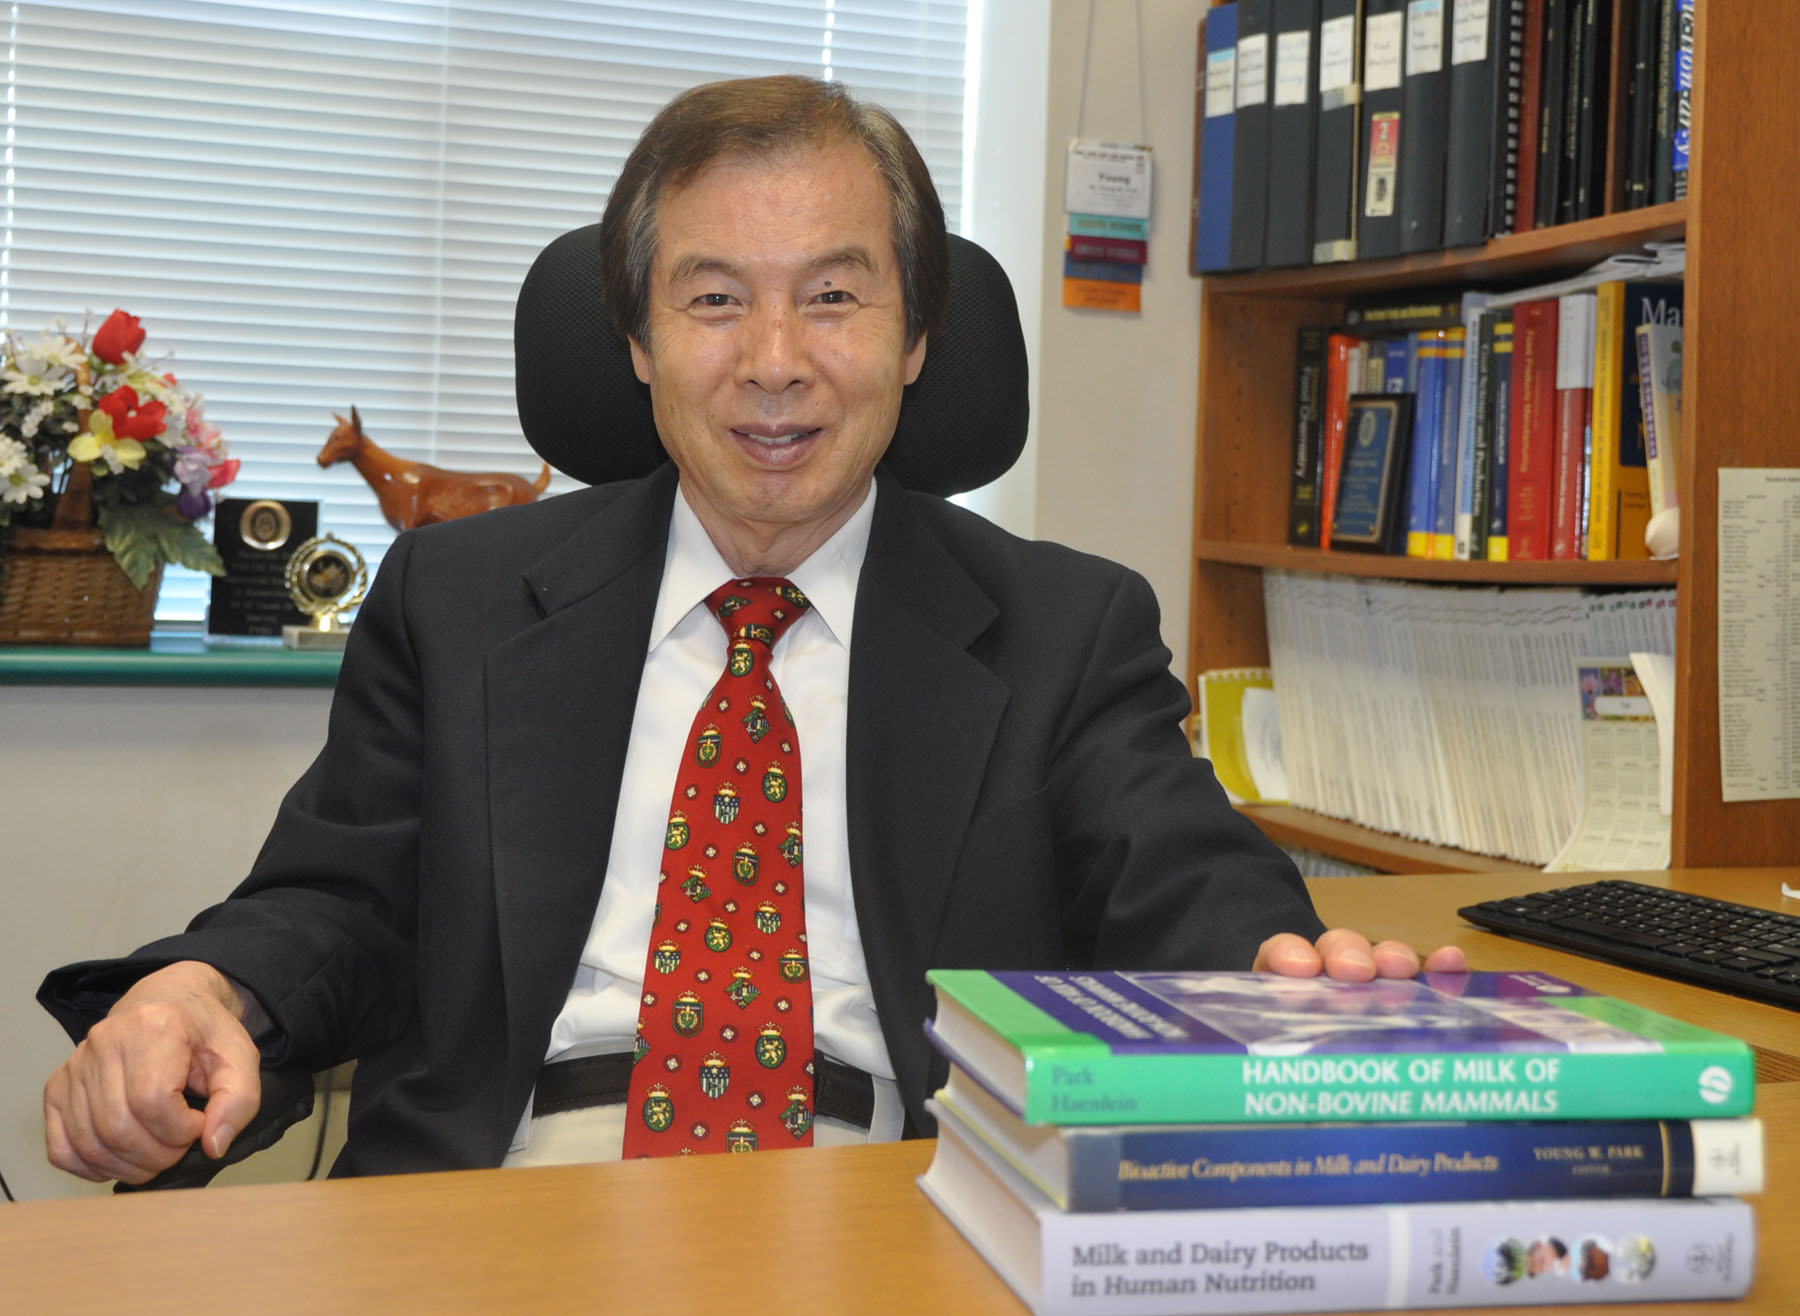 FVSU professor oversees international journal